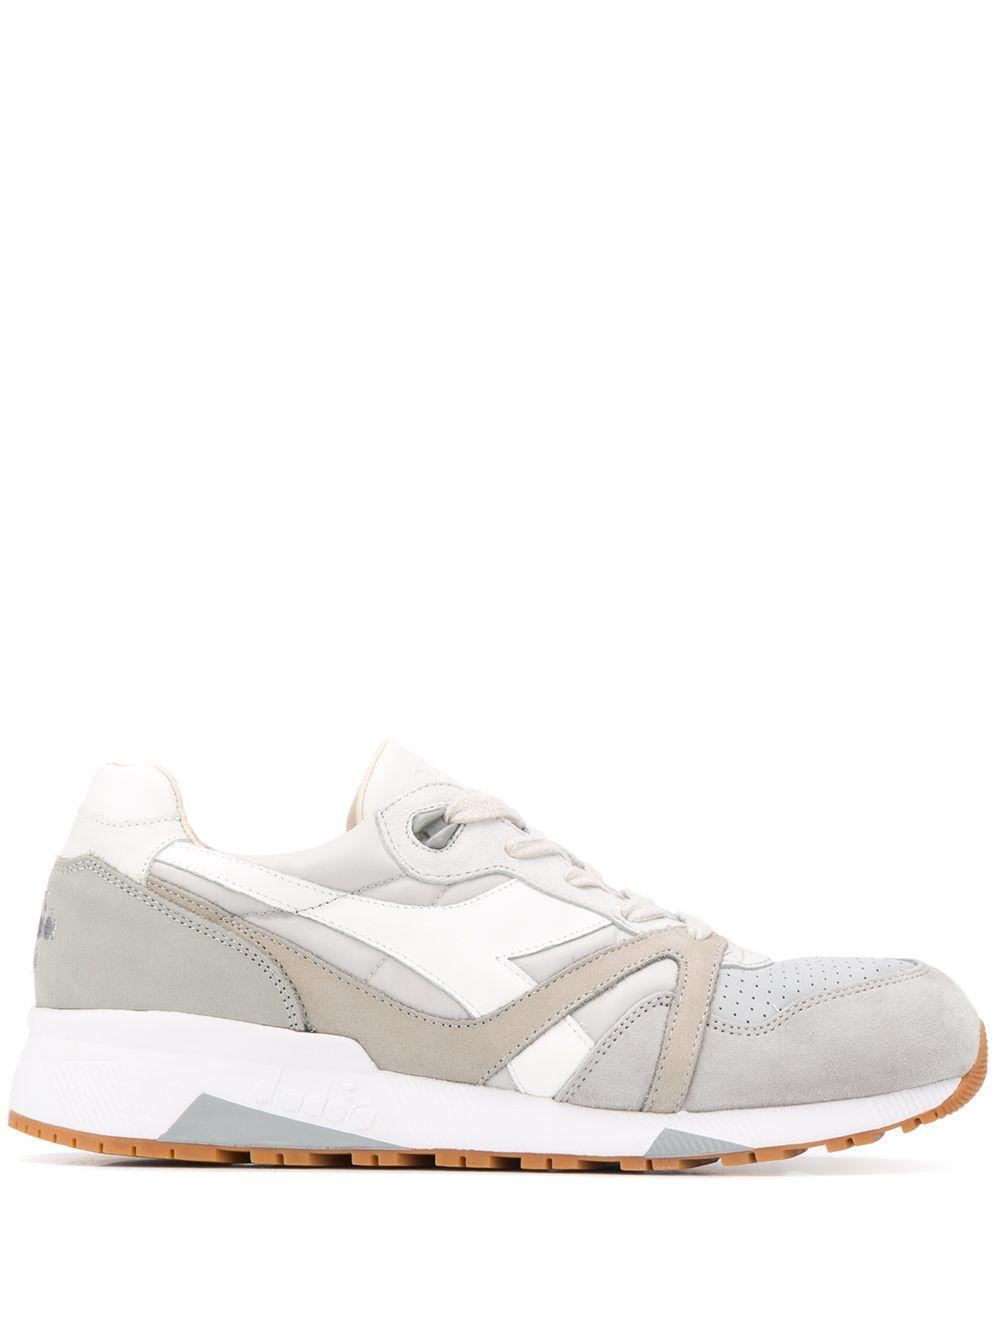 sneakers N9000 grigio chiaro DIADORA | Scarpa | 172782-N9000 H ITALIA75043